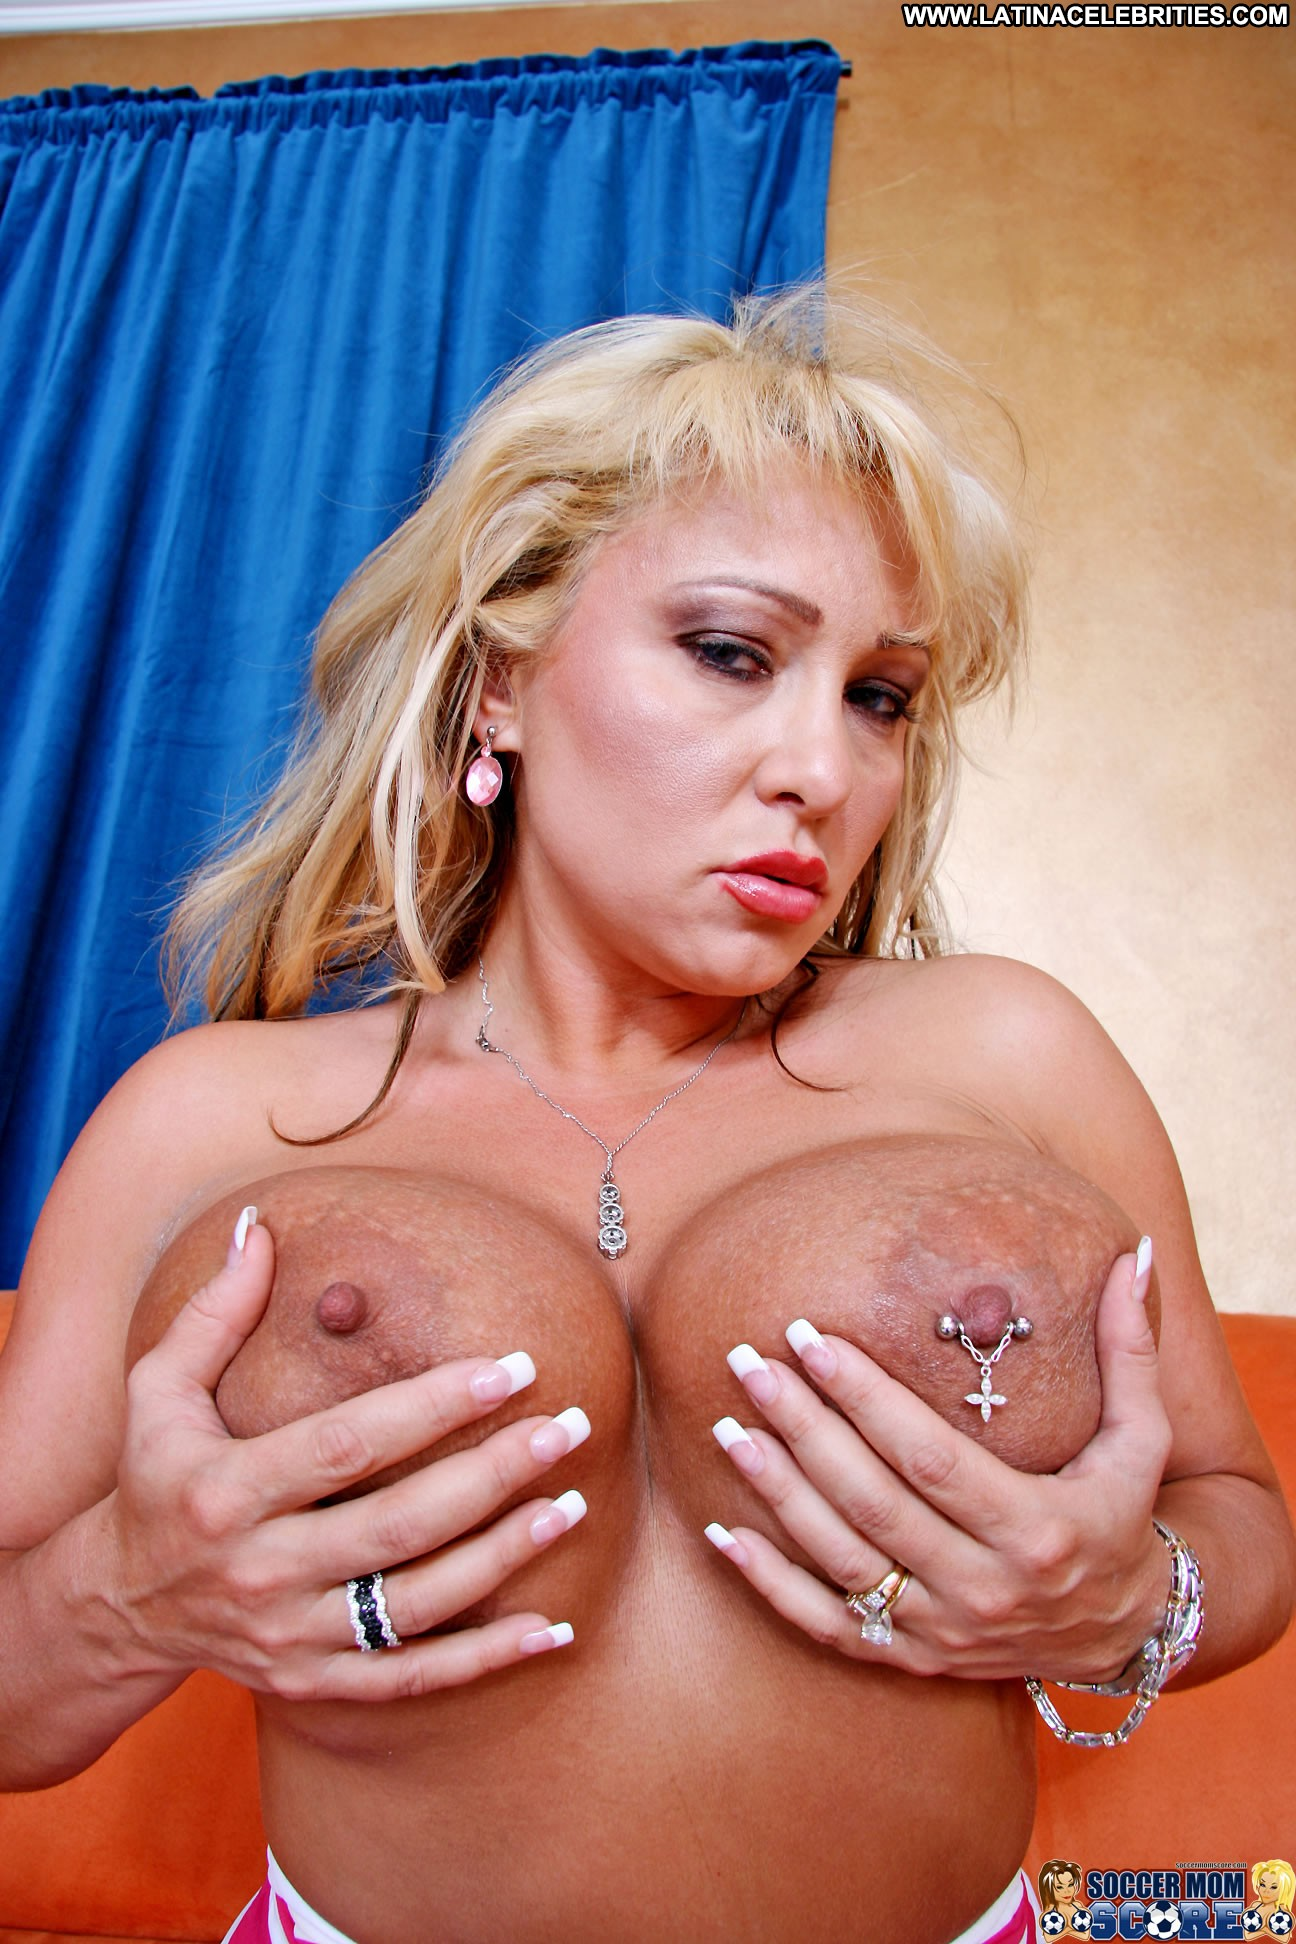 Stunning blonde mature on cam 6